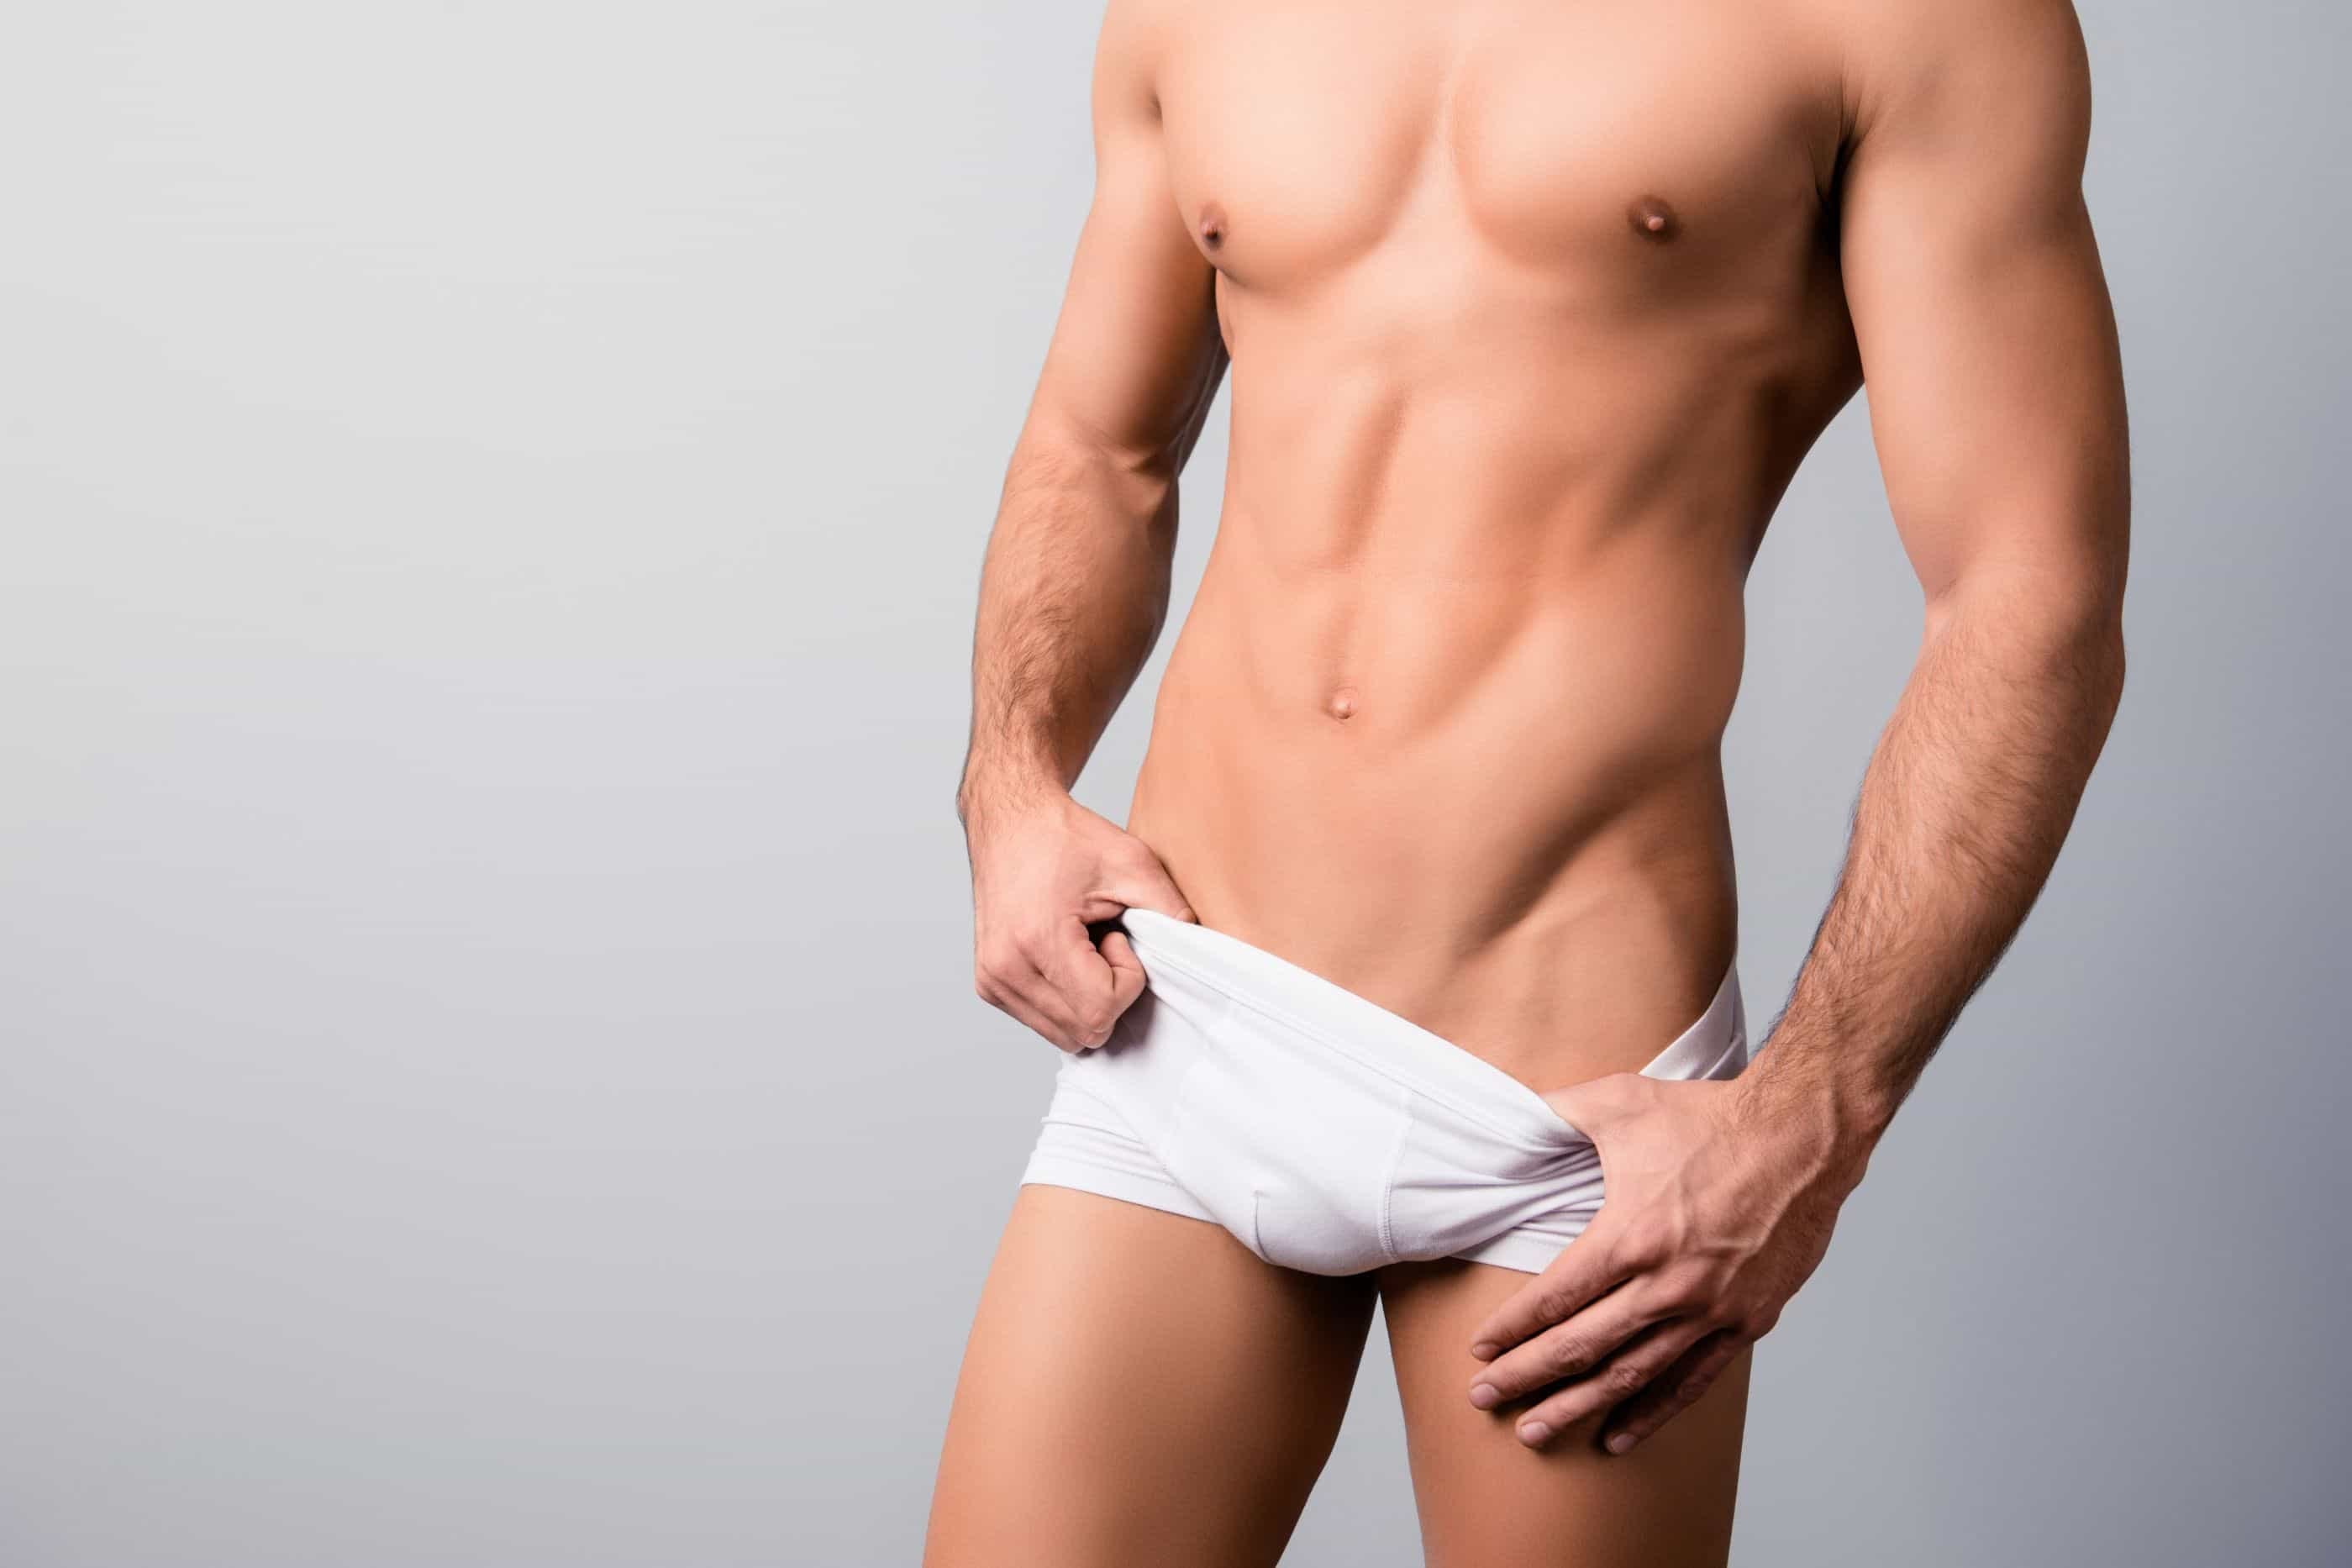 Contracetivo masculino? Cientistas testam gel que reduz espermatozoides